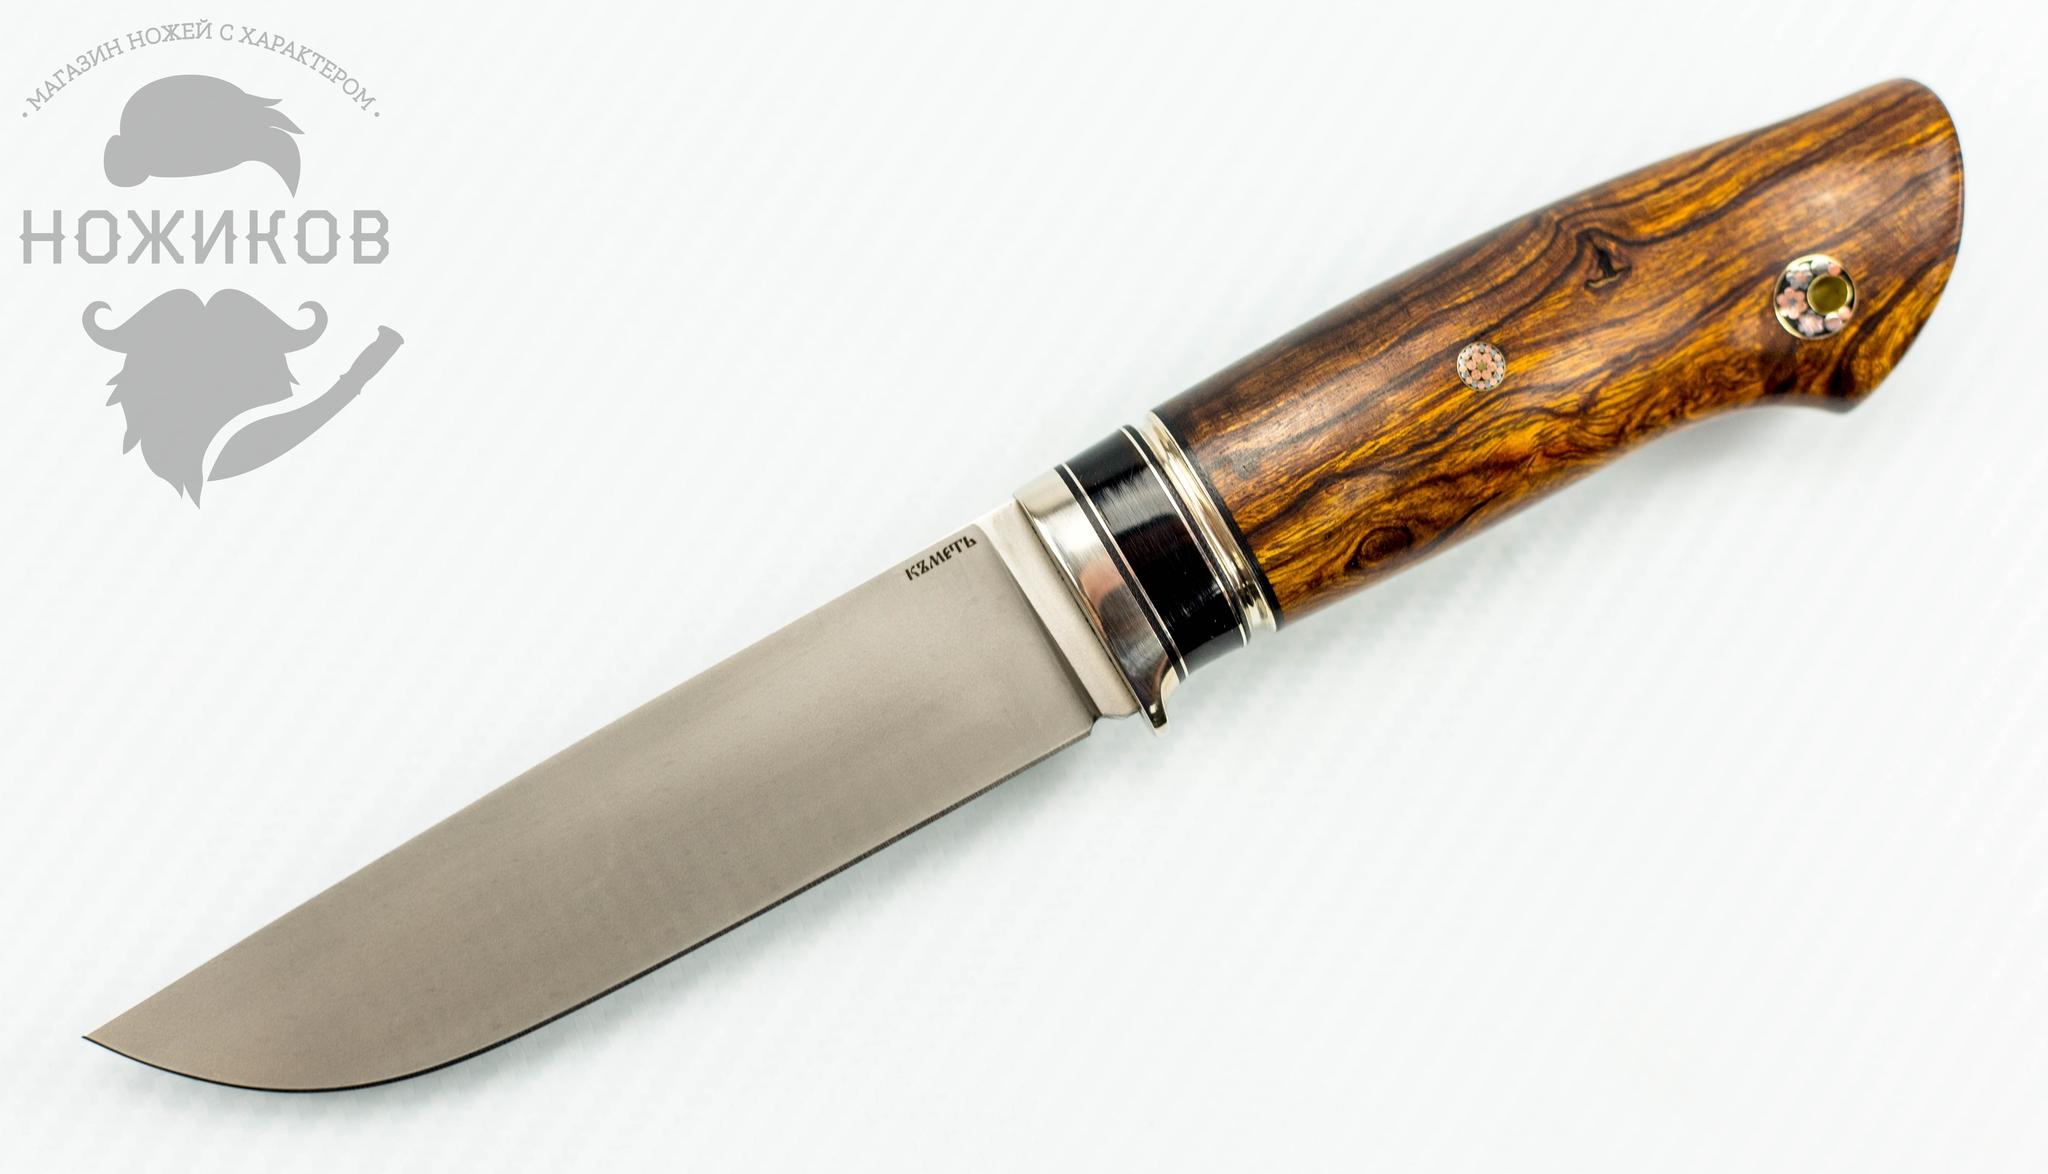 Нож Панцуй, CPM S125V, рукоять железное дерево, рог буйволаНожи Ворсма<br>Нож Панцуй, CPM S125V, рукоять железное дерево, рог буйвола<br>